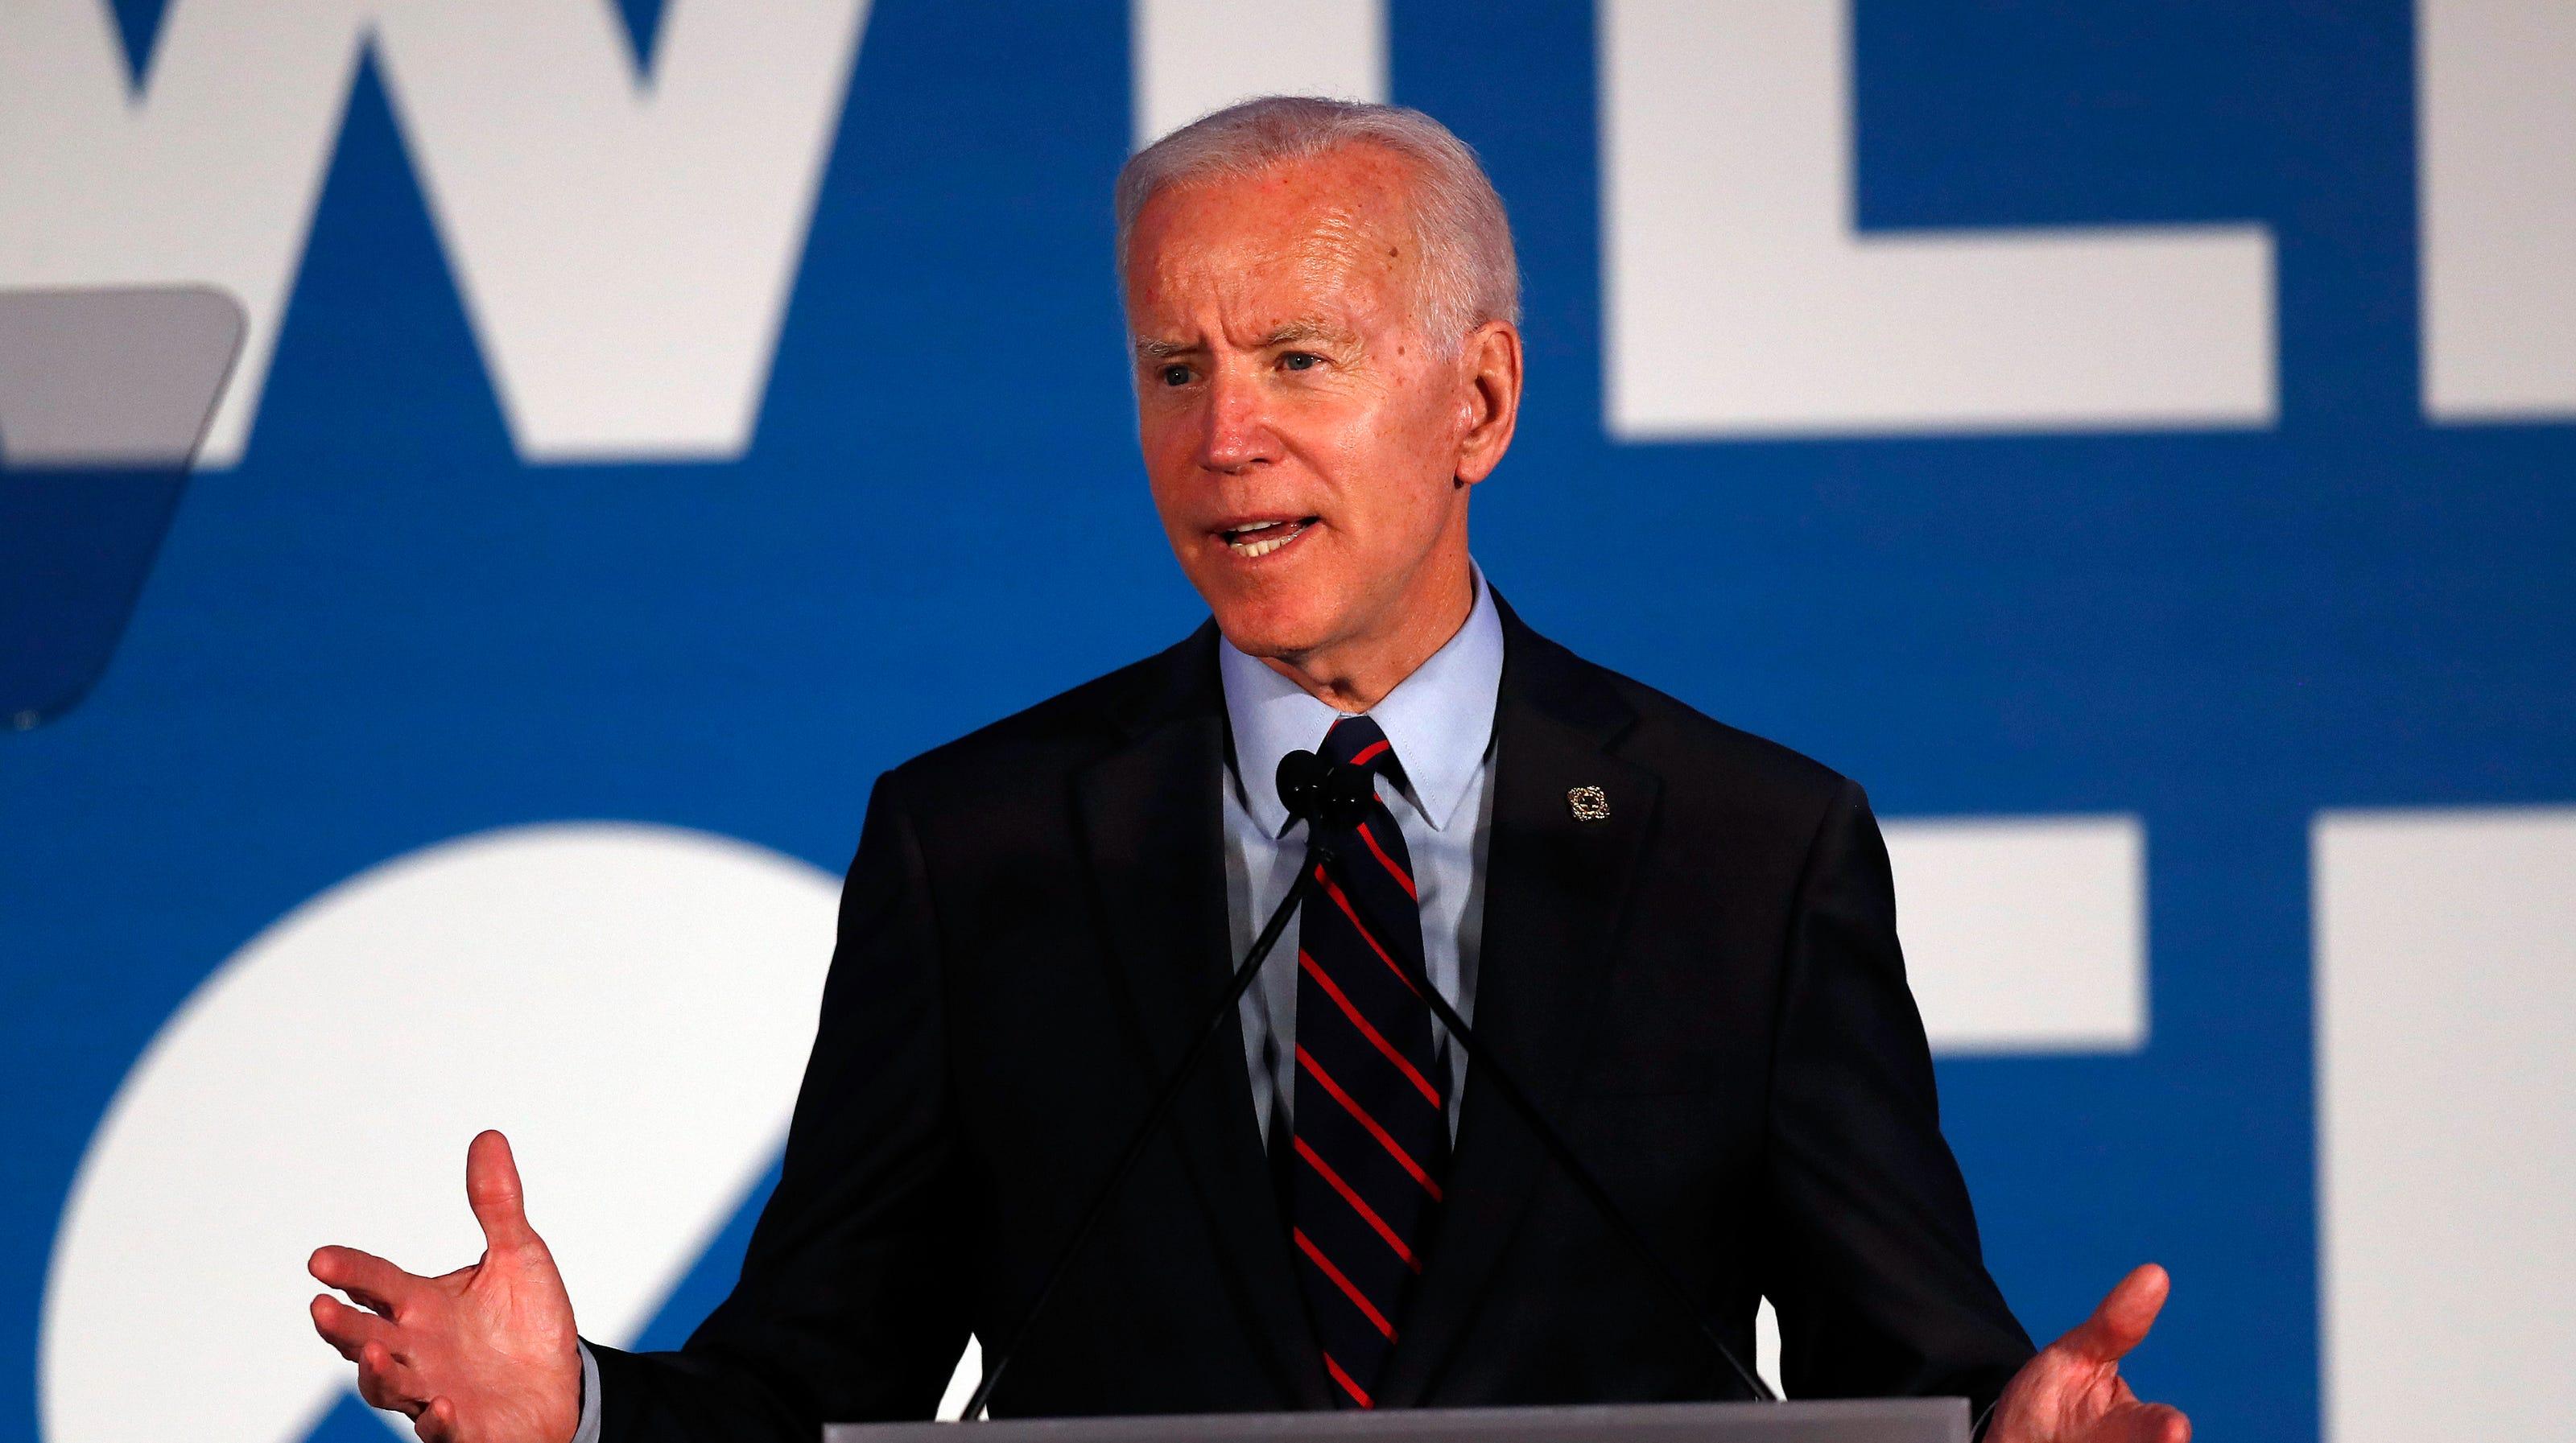 Scientific American magazine backs Joe Biden, its first presidential endorsement in 175 years